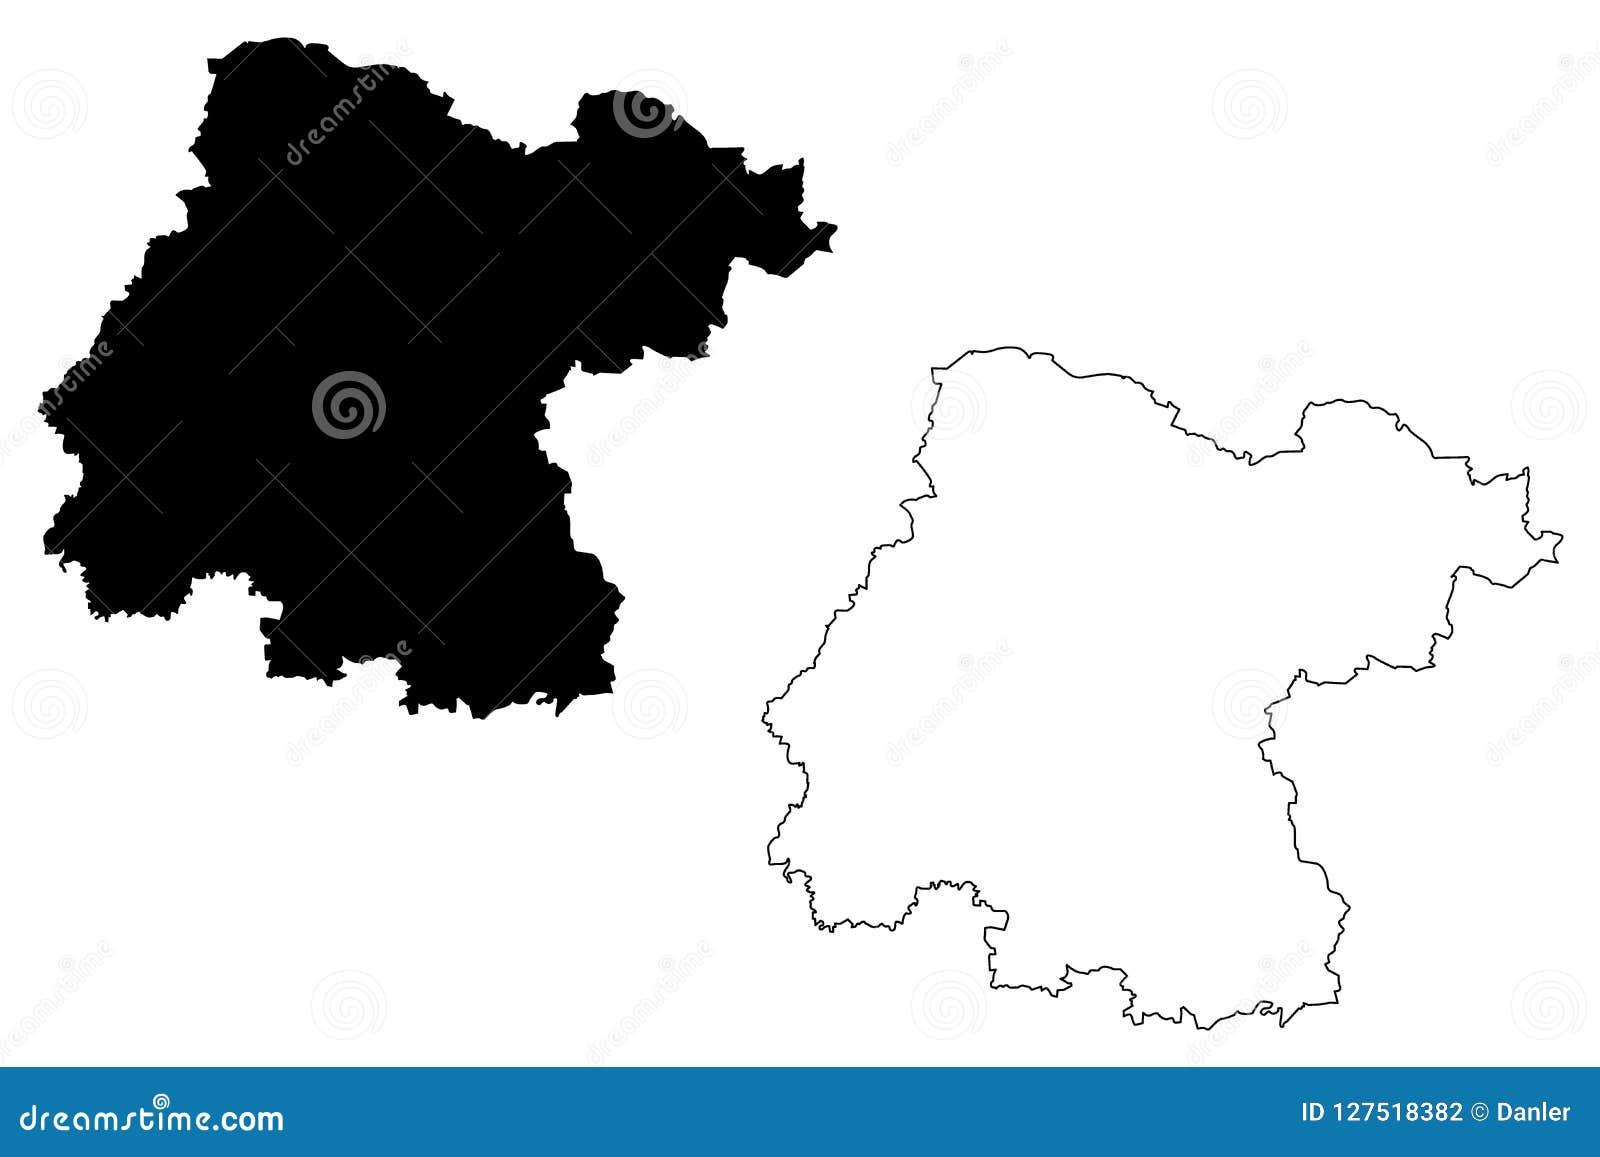 Mexico Map Guanajuato.Guanajuato Map Vector Stock Vector Illustration Of Country 127518382